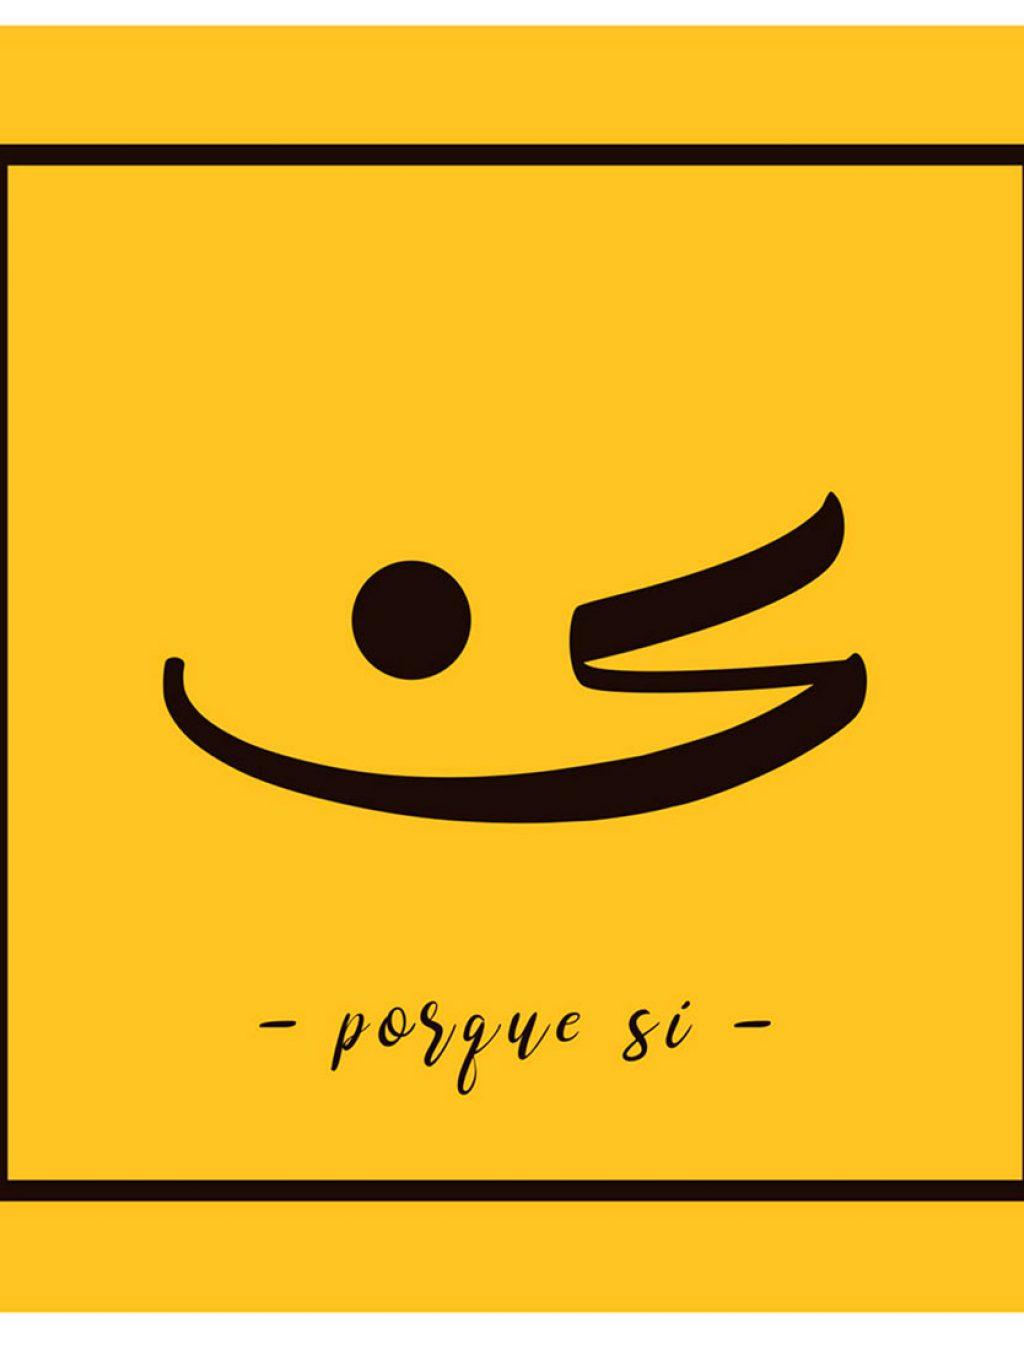 agencia-pennyworth-marketing-digital-identidad-corporativa-branding-restaurante-valencia-07